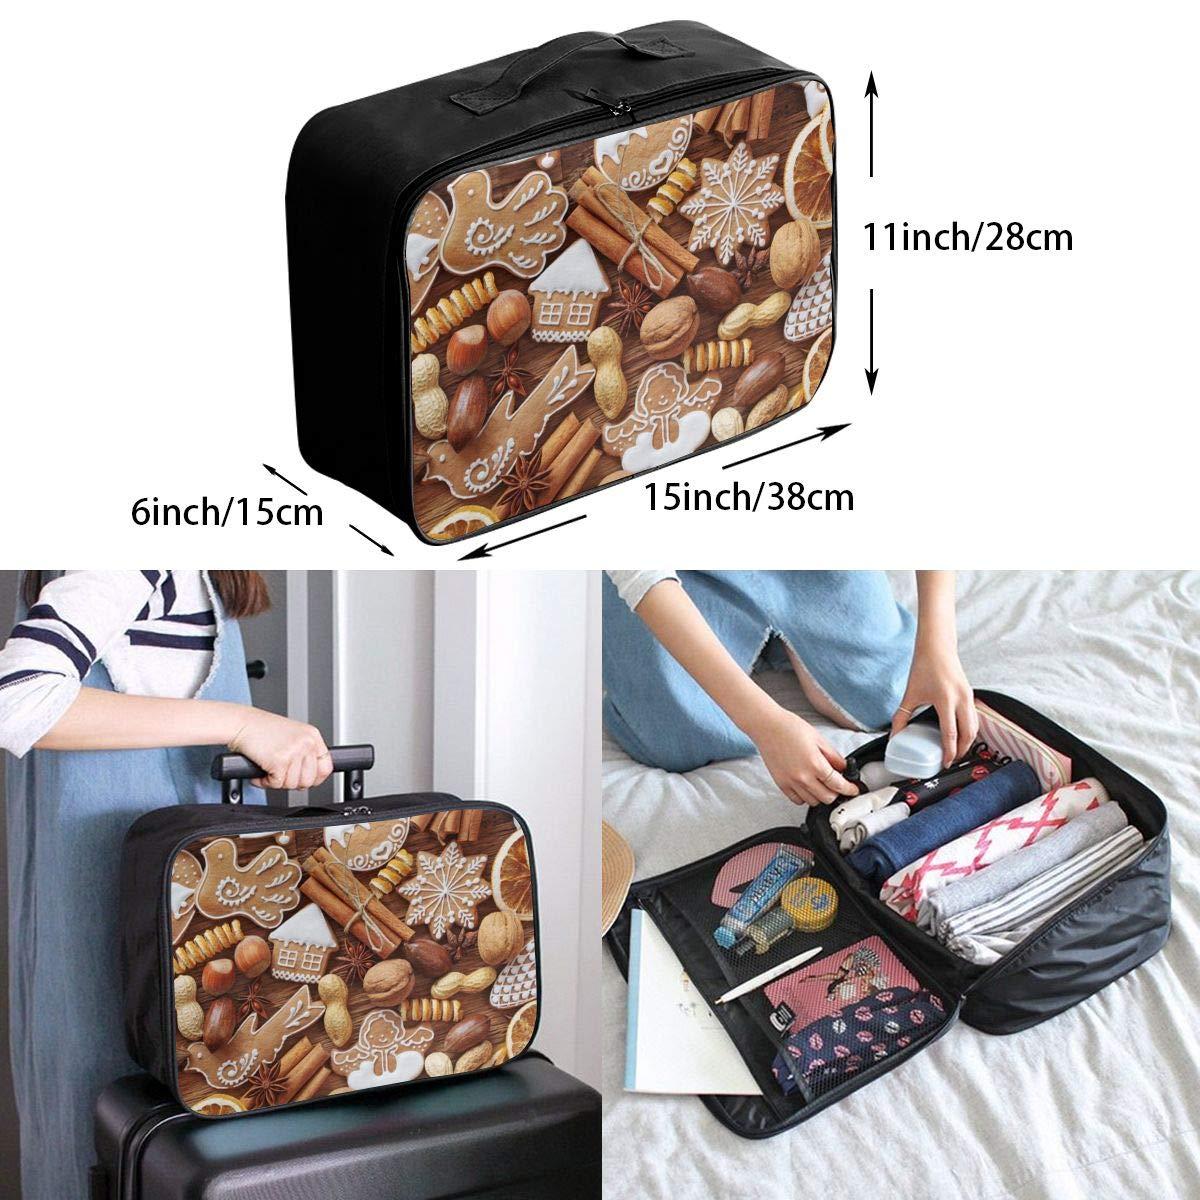 Travel Luggage Duffle Bag Lightweight Portable Handbag Nuts Cookies Large Capacity Waterproof Foldable Storage Tote